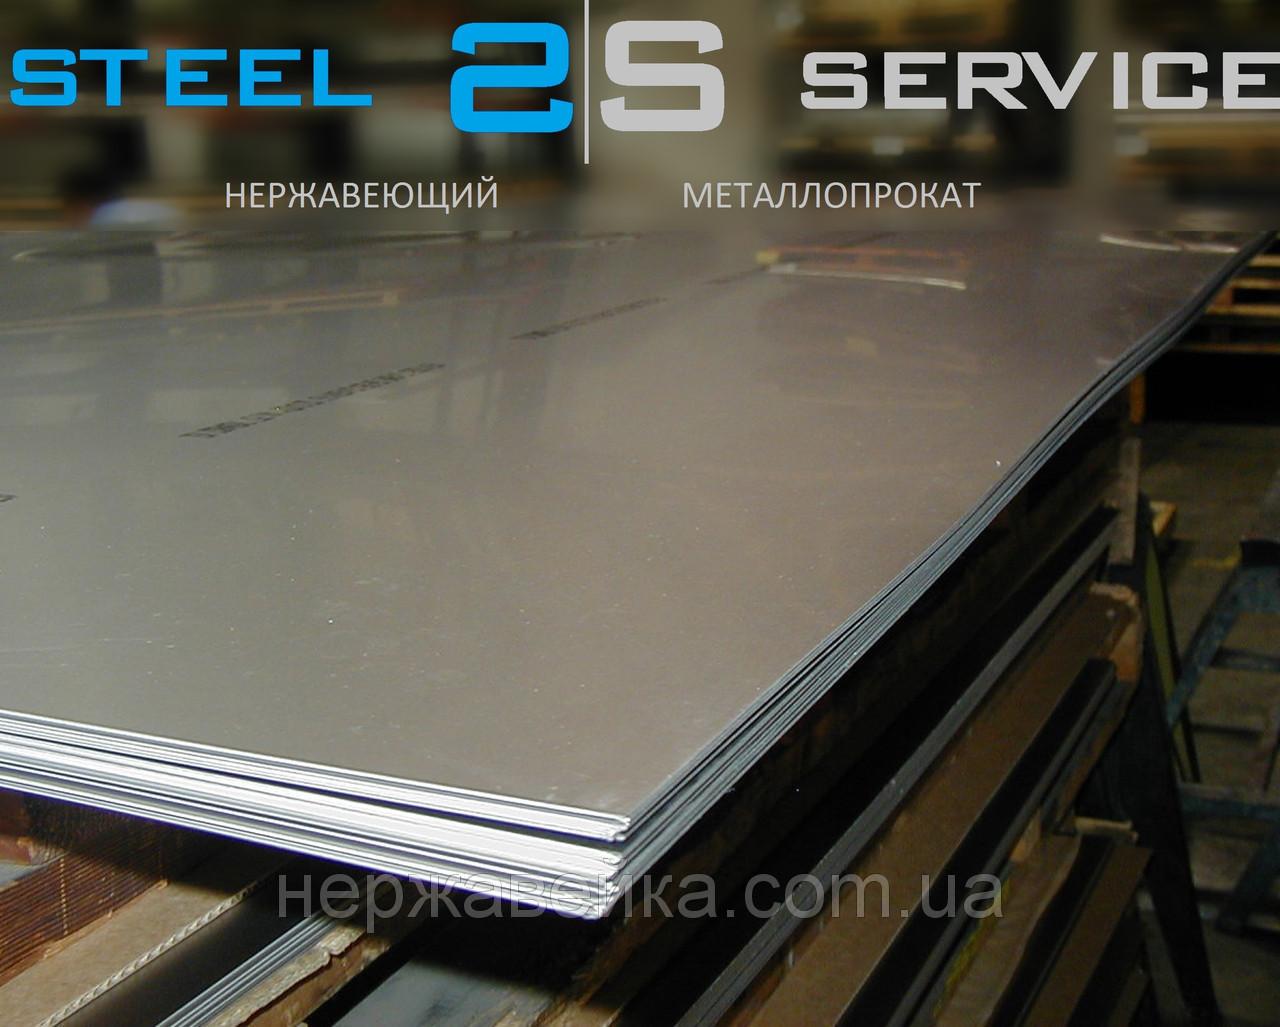 Нержавейка лист 2х1250х2500мм AISI 430(12Х17) 2B - матовый, технический